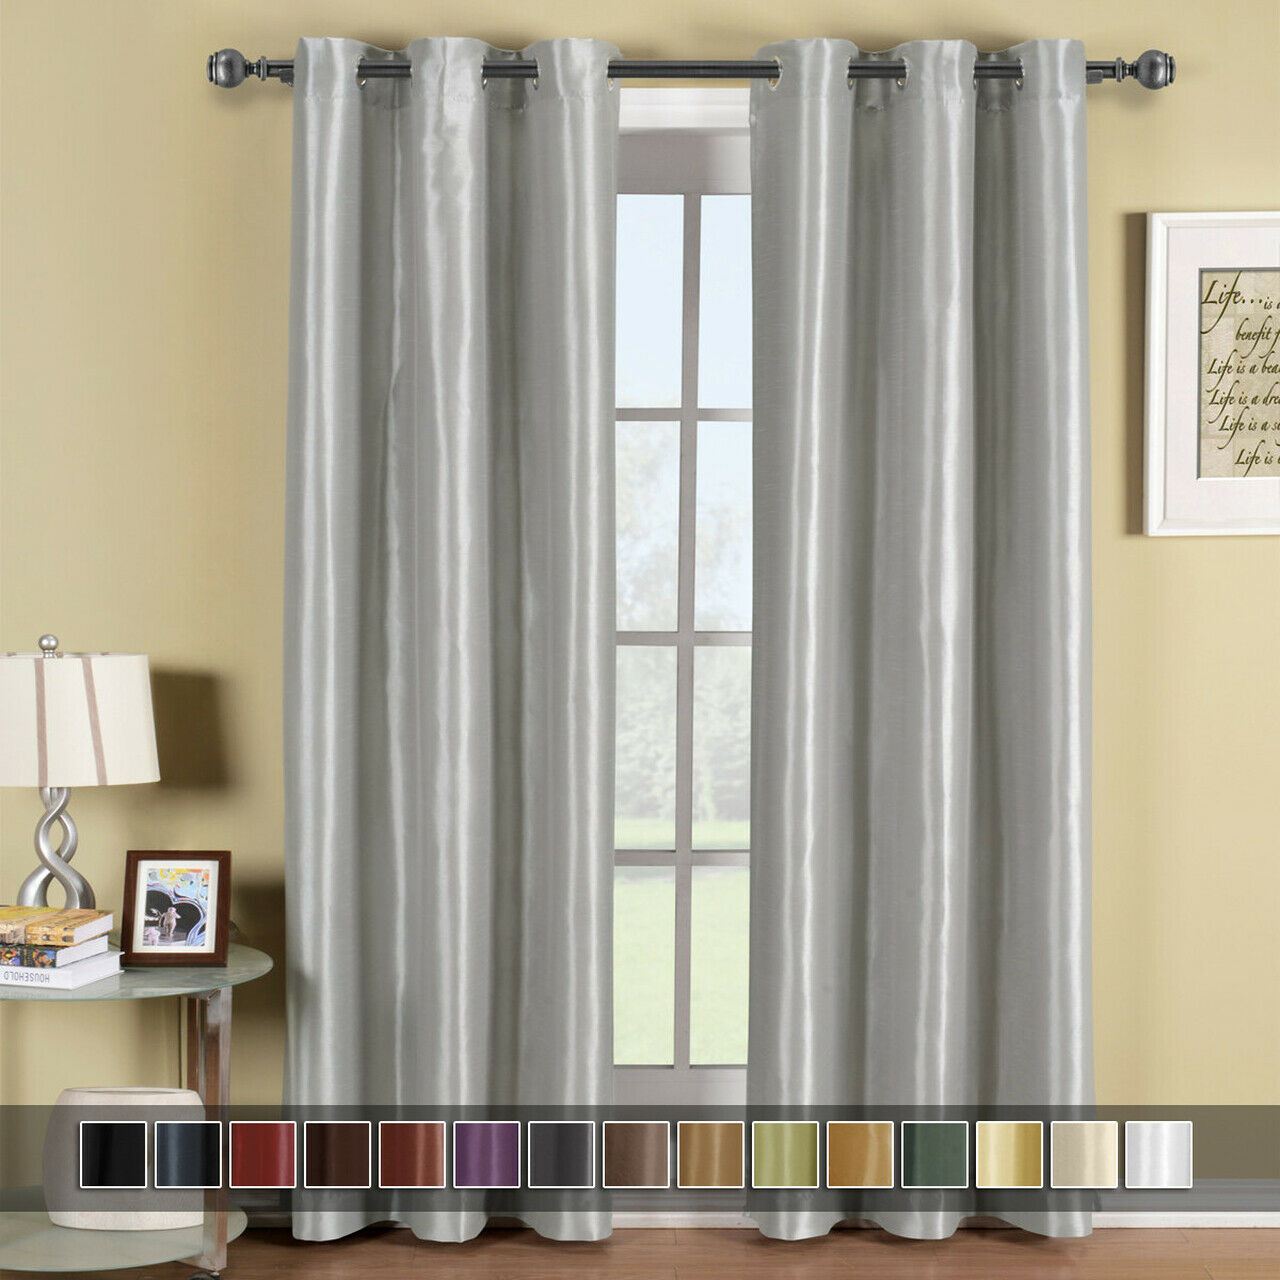 Soho Top Grommet Thermal Blackout Window Curtain Panels Soli